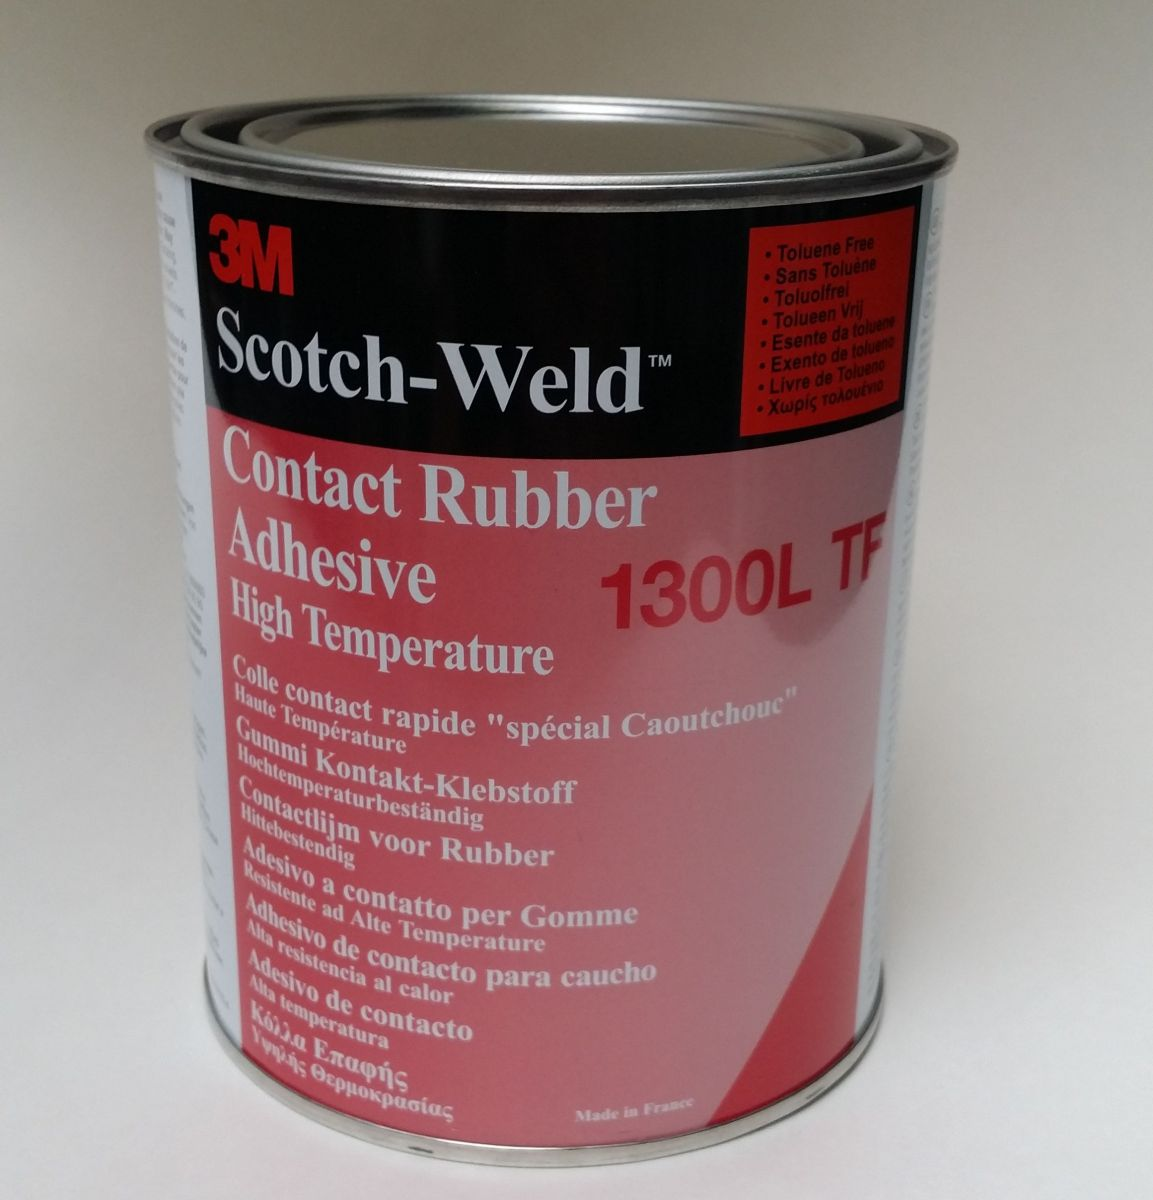 3m scotchweld contactlijm 1300ltf rubber en pakkingen 1l